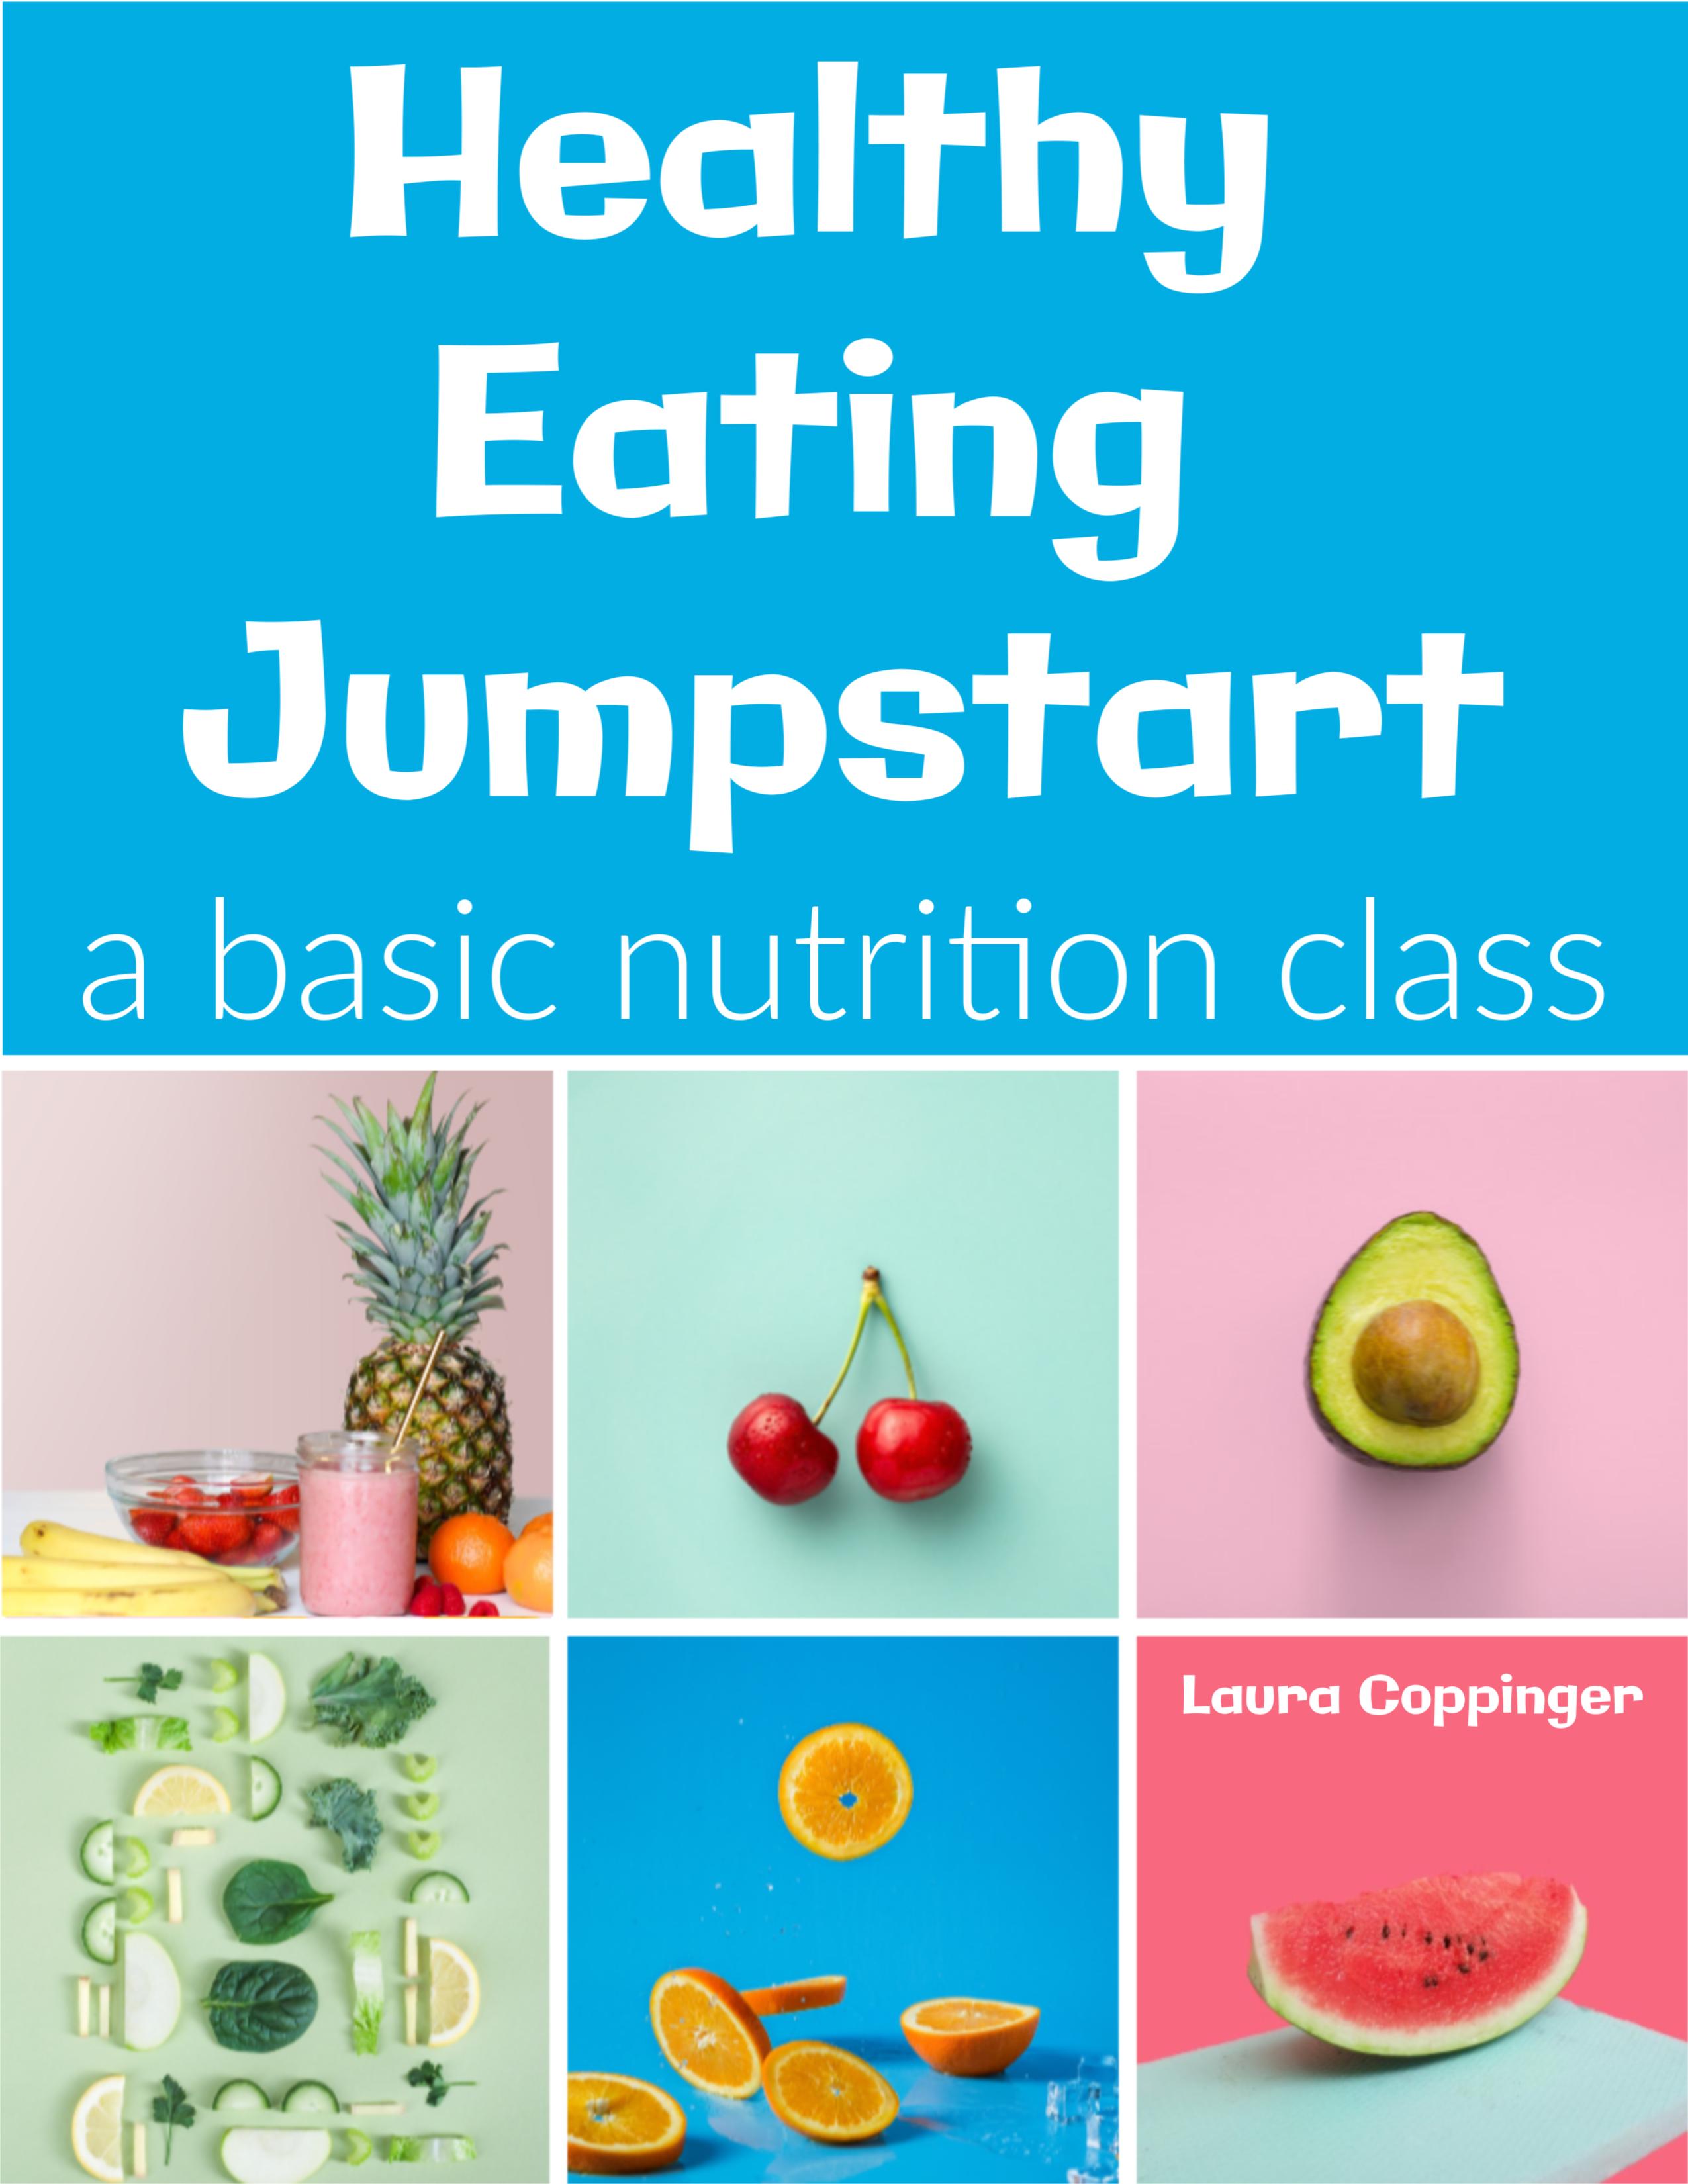 Healthy Eating Jumpstart Nutrition Class